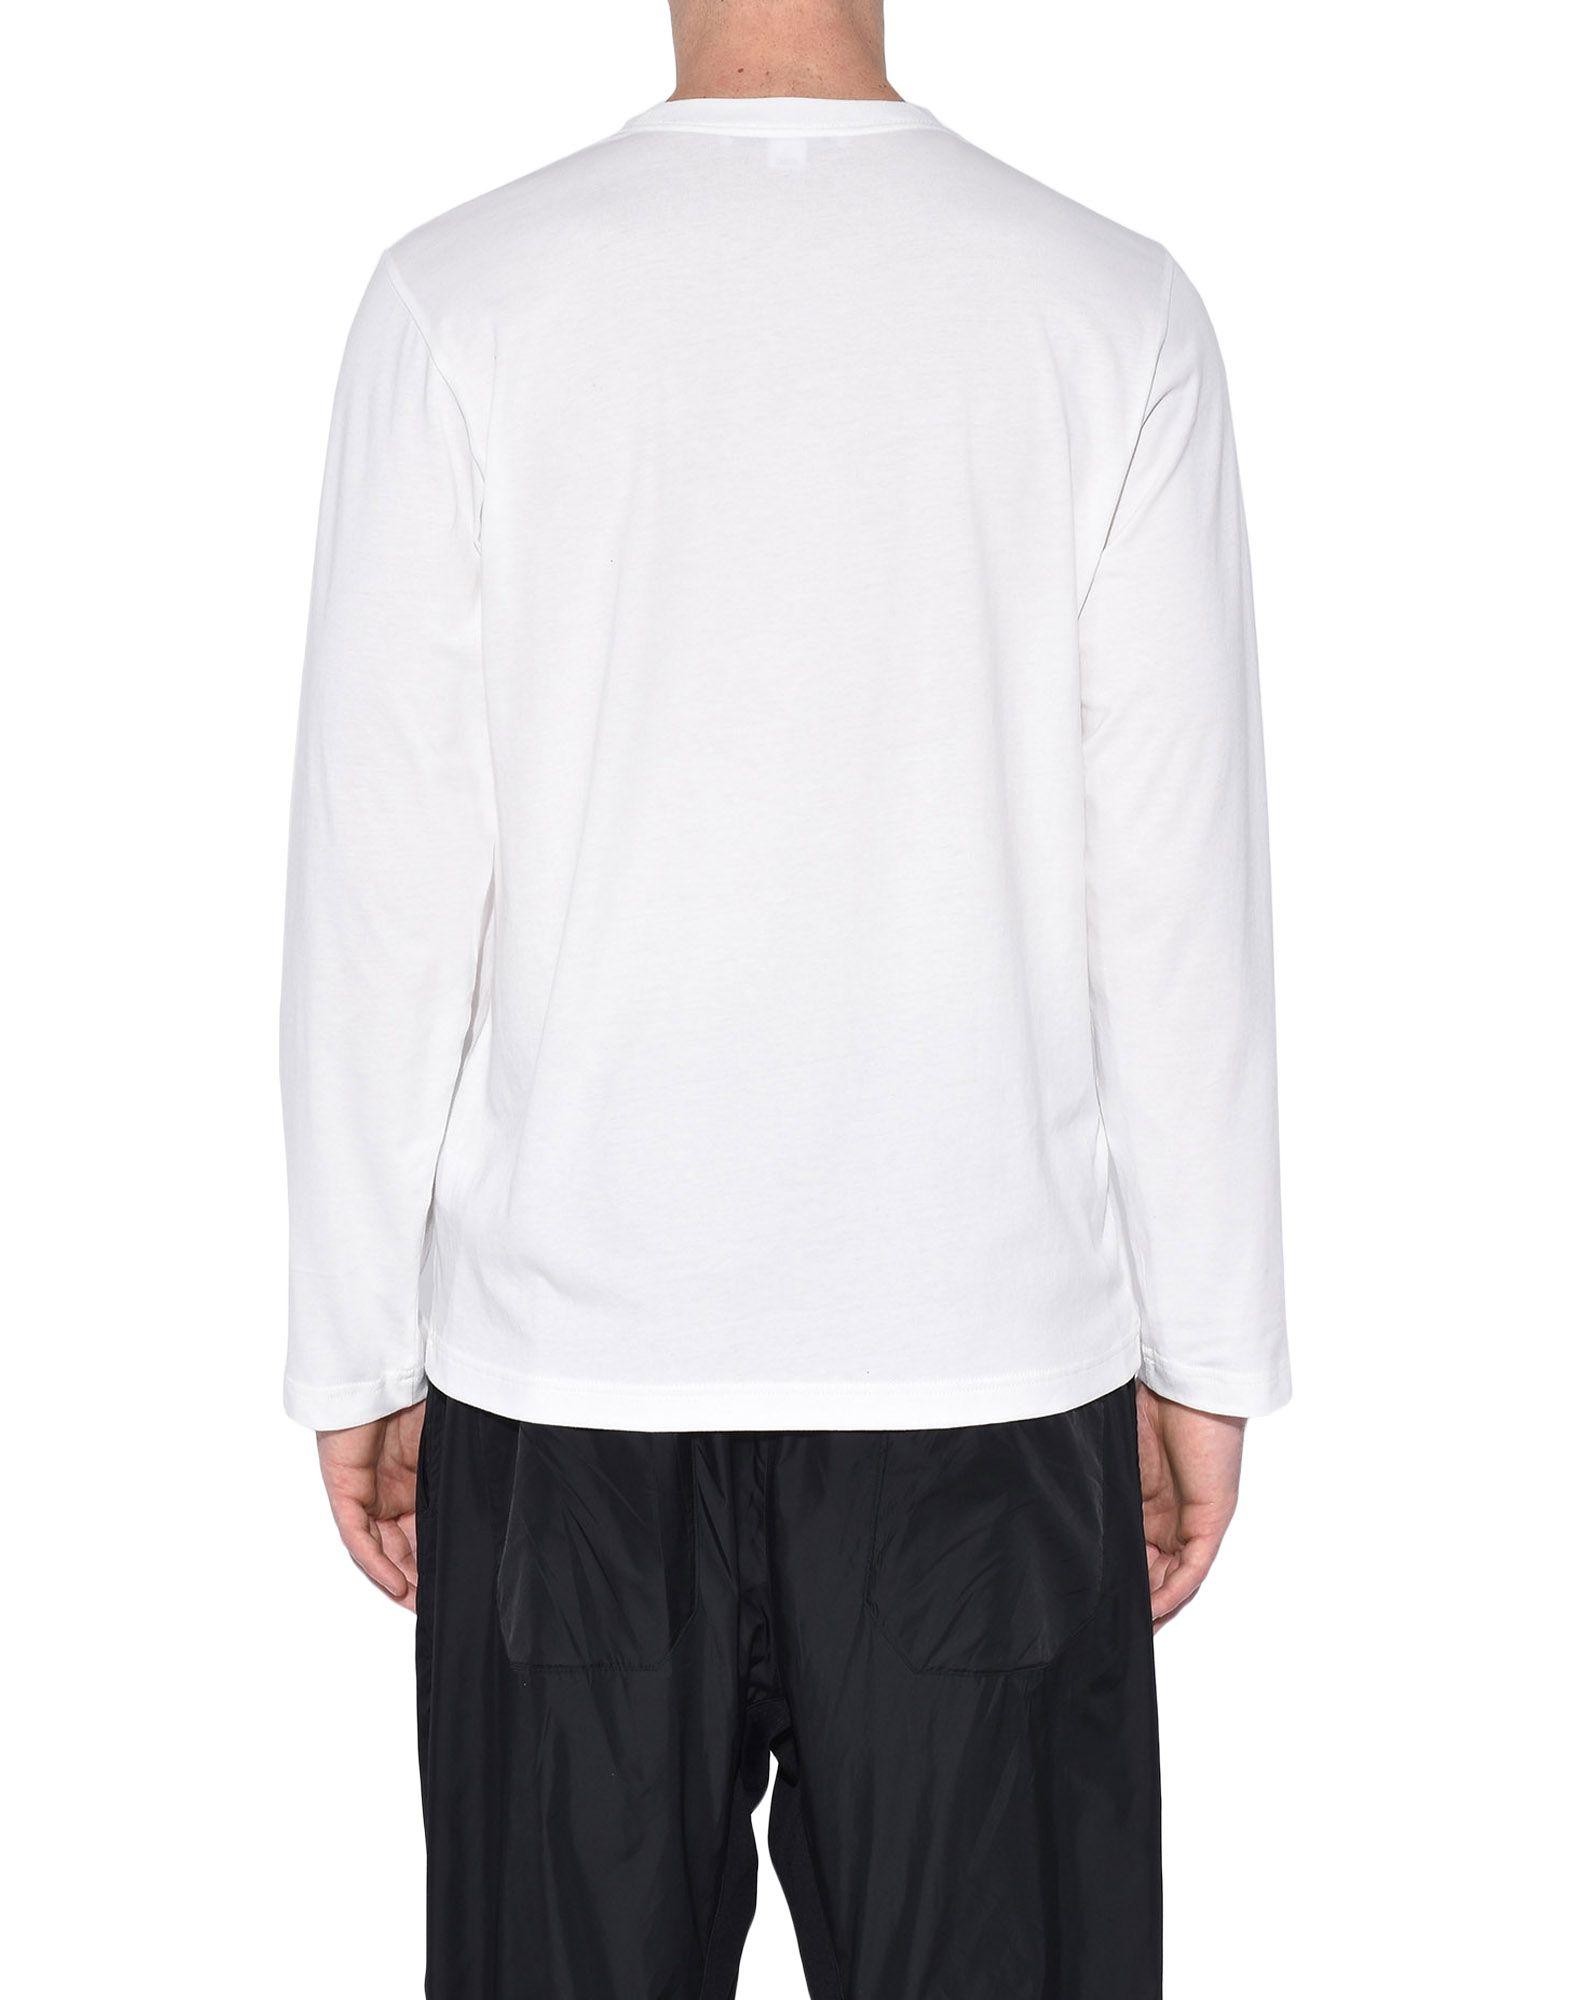 Y-3 Y-3 Classic Tee Long sleeve t-shirt Man d